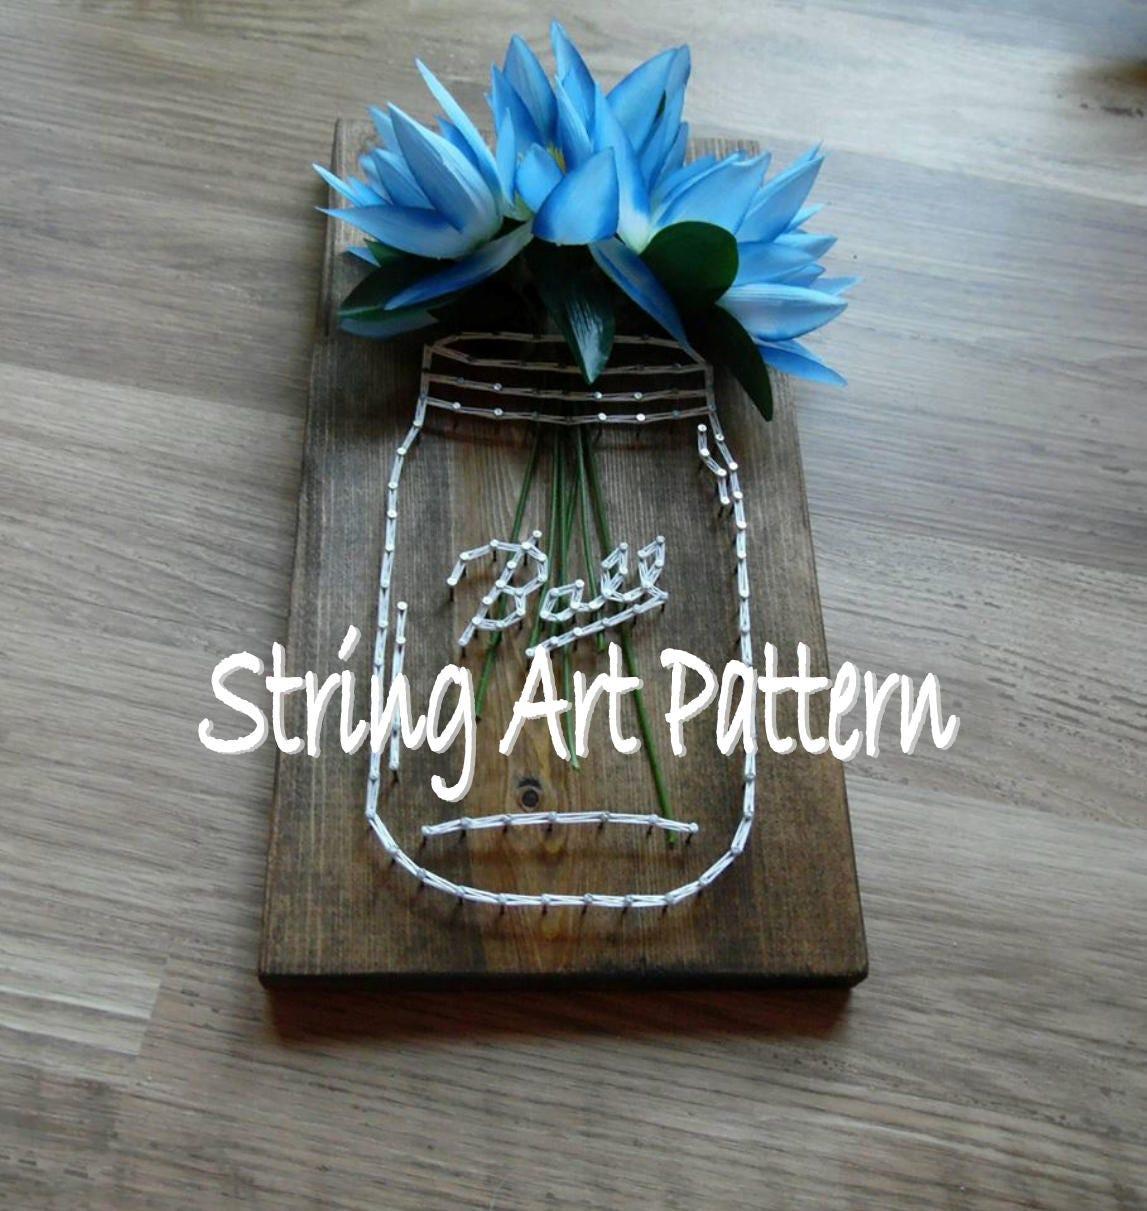 yarn art color garden : Ball Mason Jar String Art Pattern Mason Jar String Art Pattern Ball Jar Pattern String Art Mason Jar Pattern Diy Mason Jar String Art